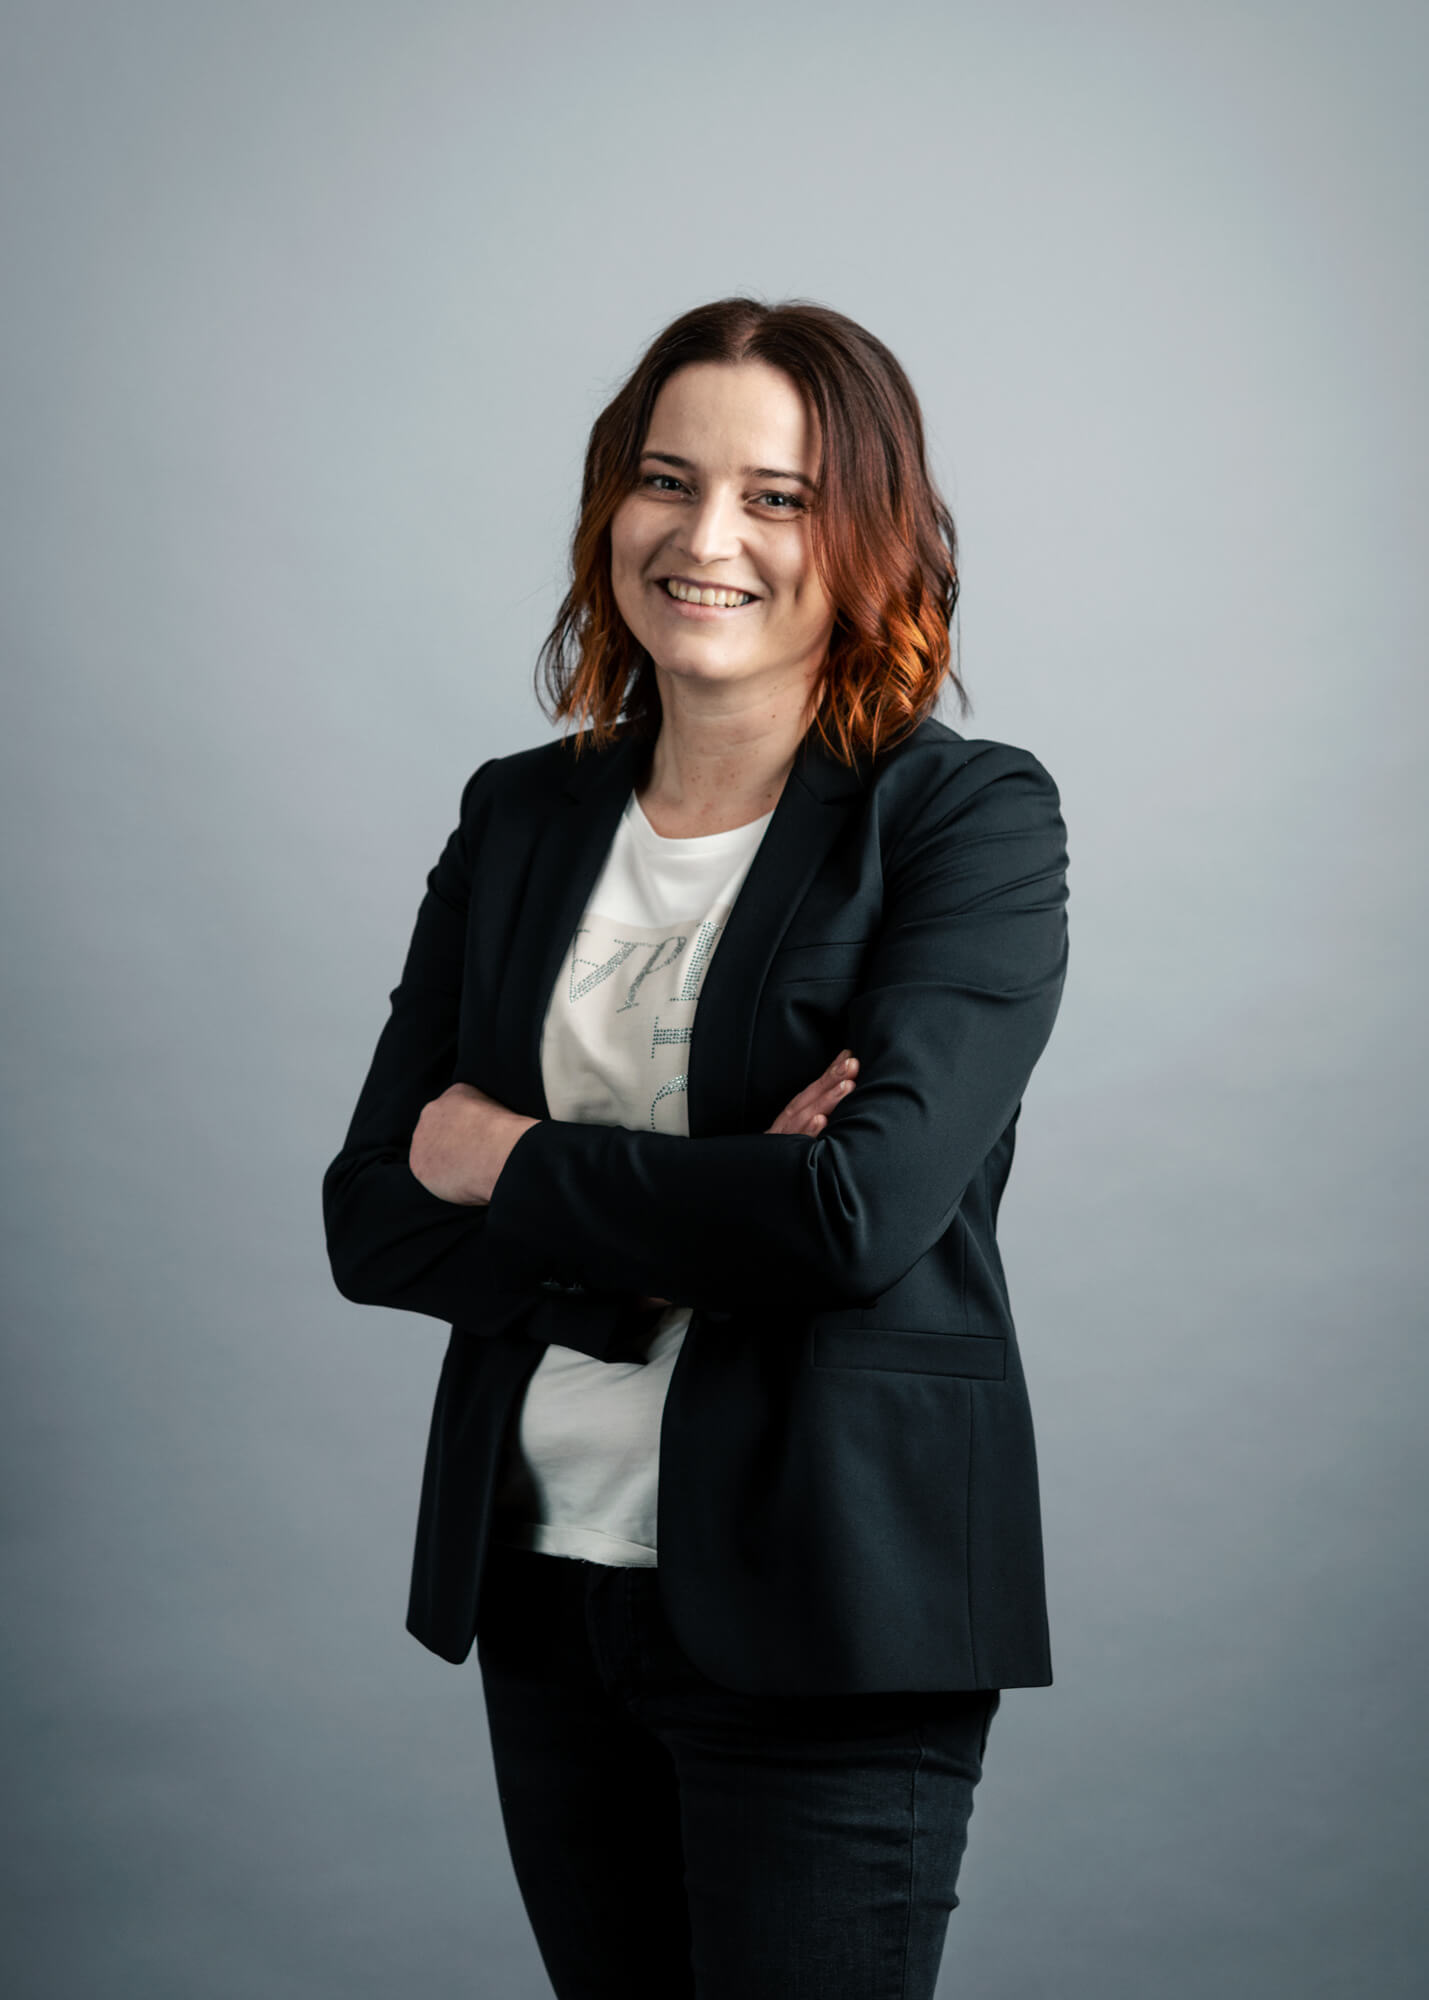 Evelyn Hofer